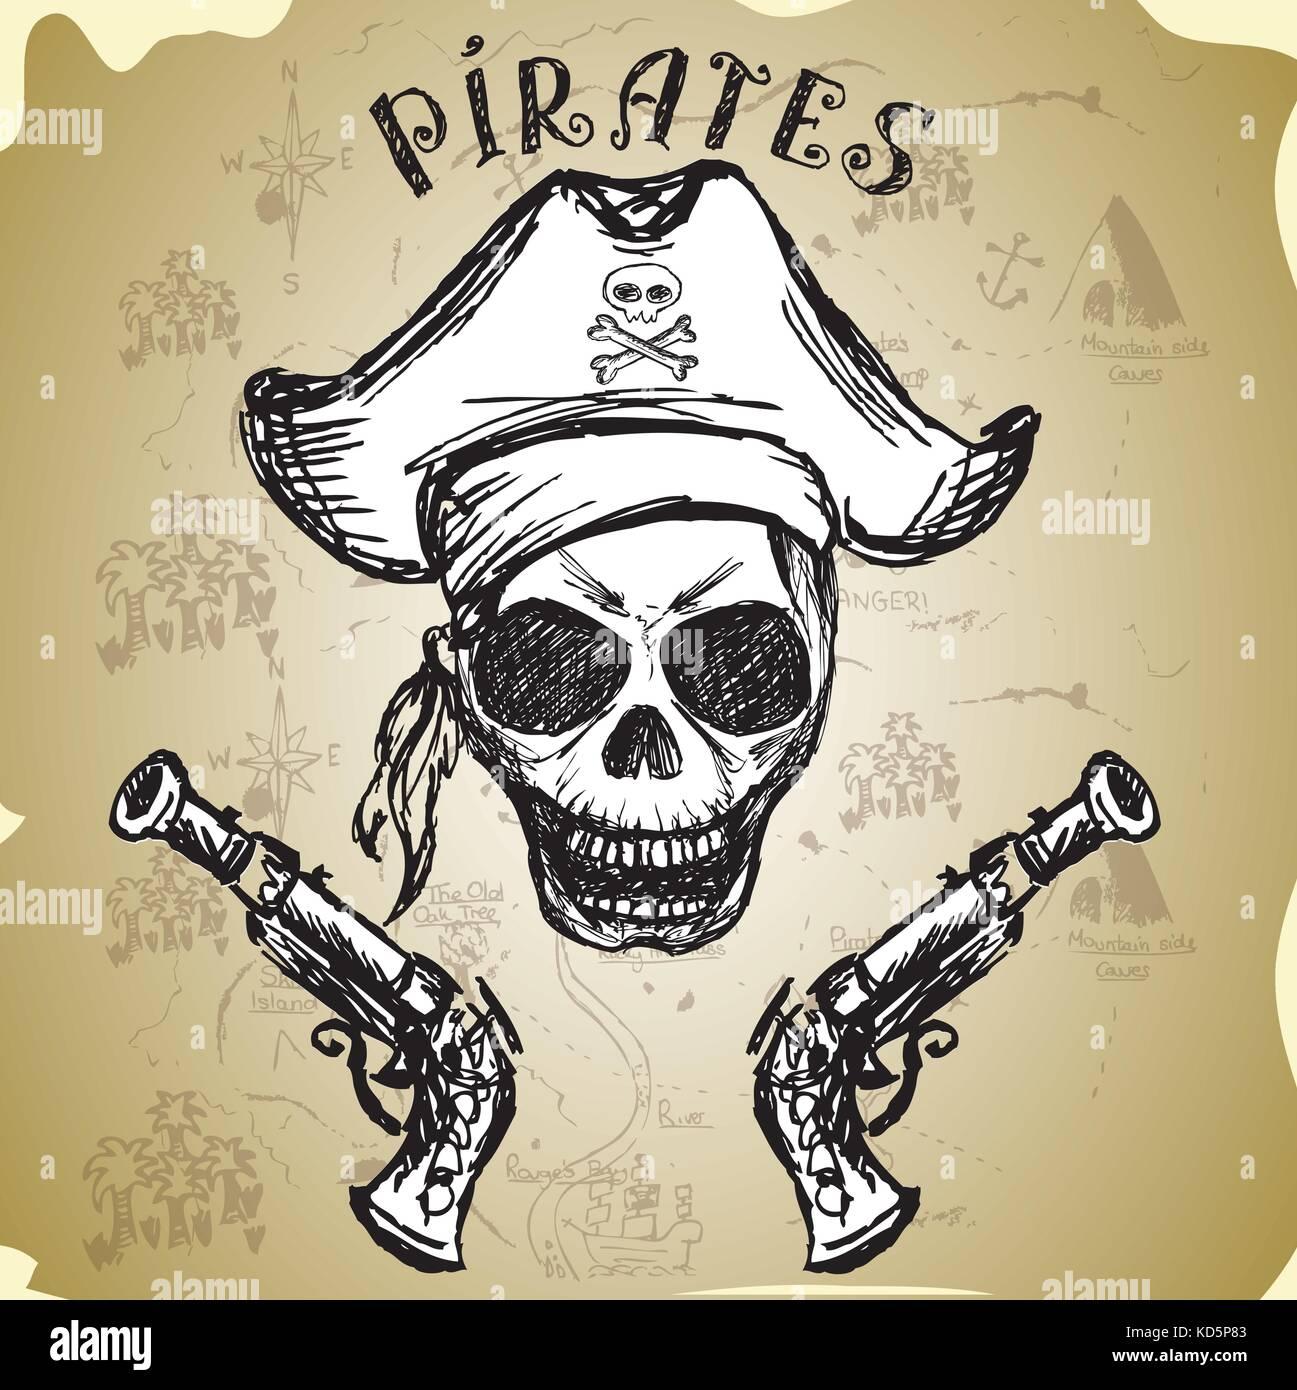 Pirate calavera con sombrero y pistolas ebafe81bc6e